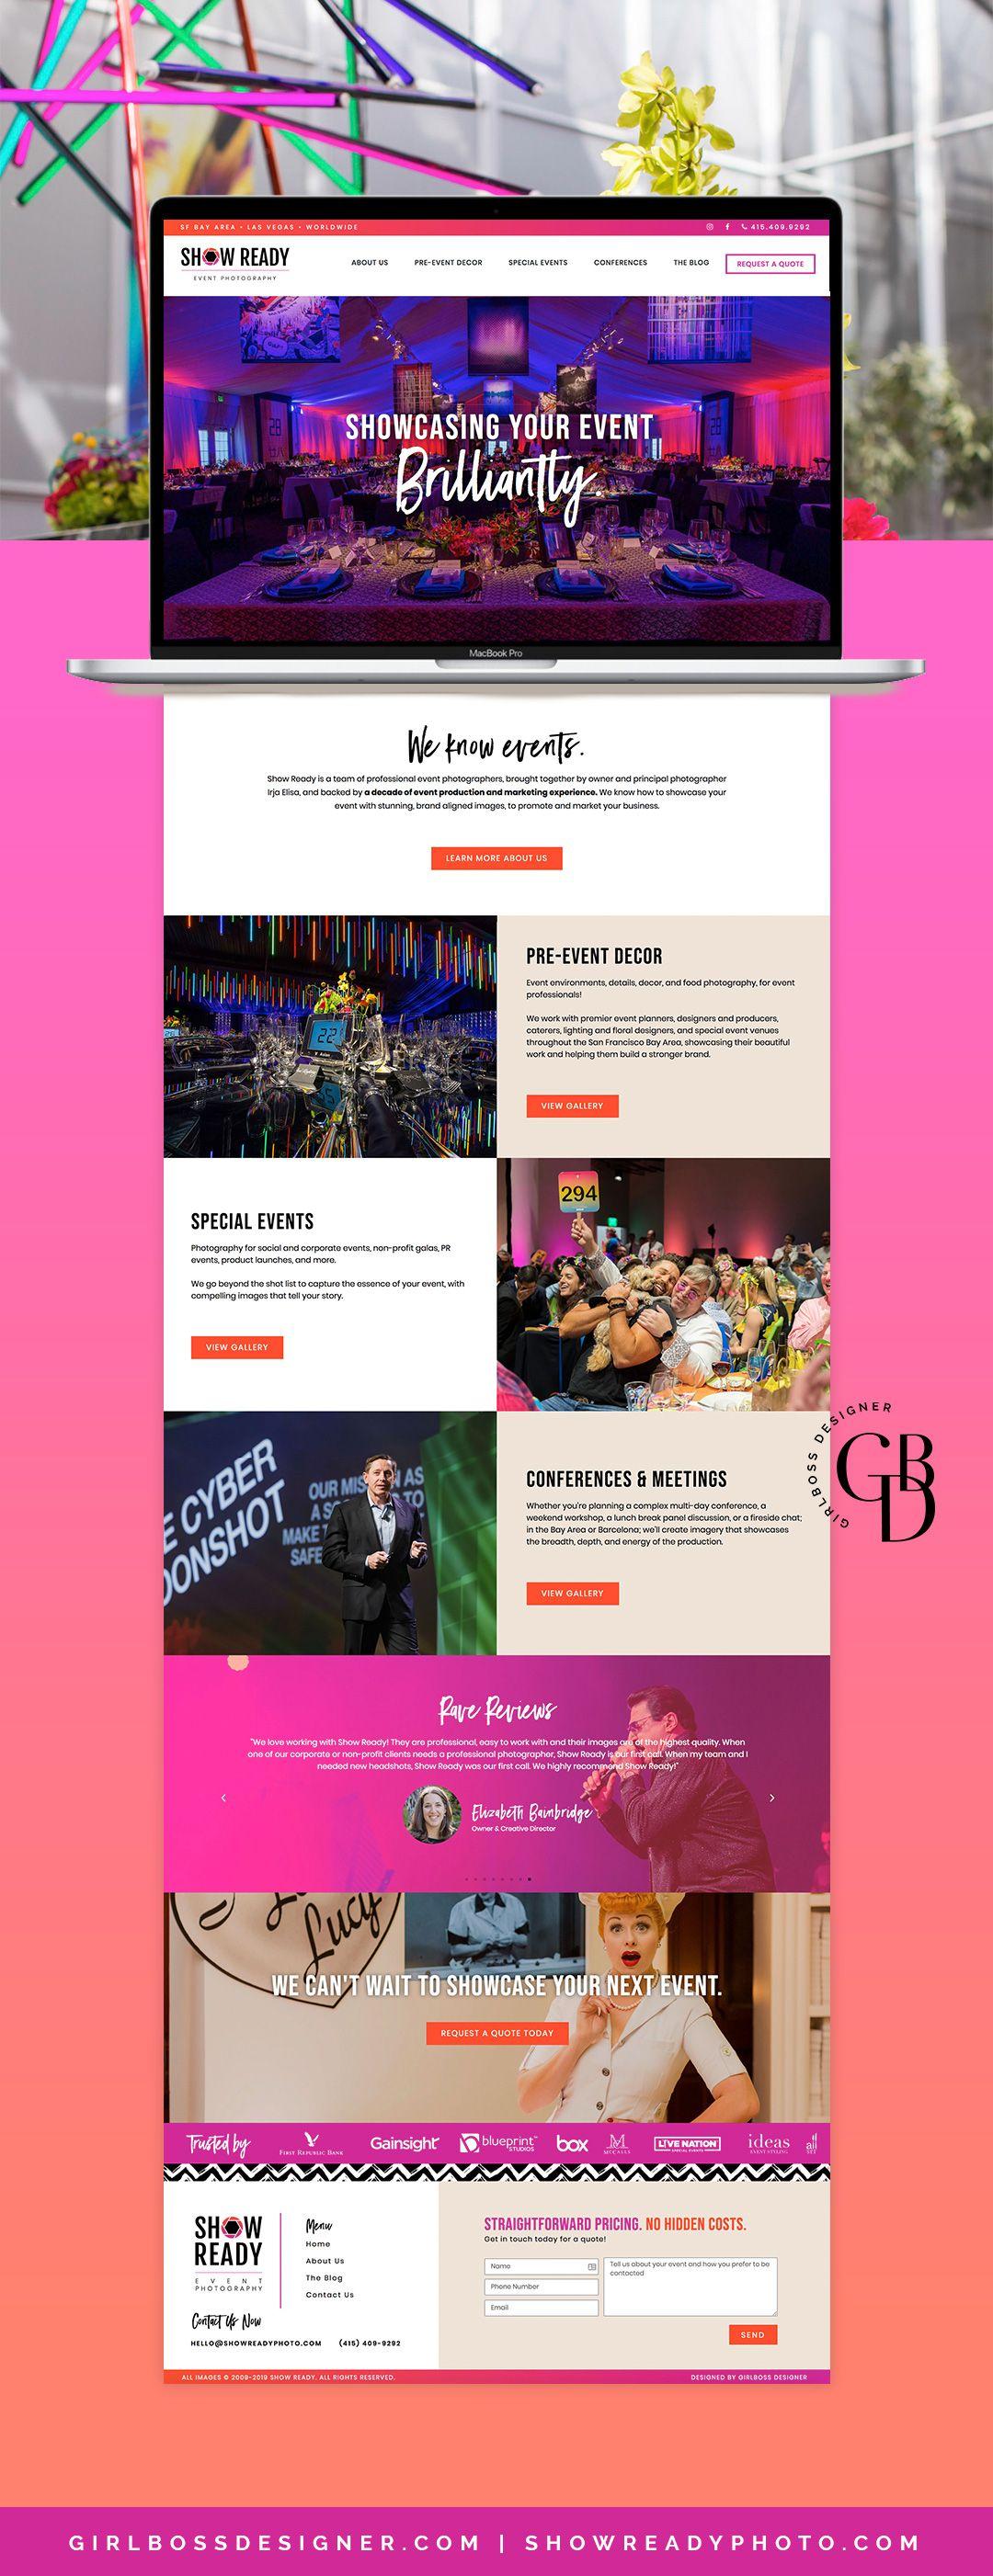 Modern Edgy Branding Update And Web Design San Francisco Based Event Photographer Show Ready By Girlbo Web Design Website Design Inspiration Event Website